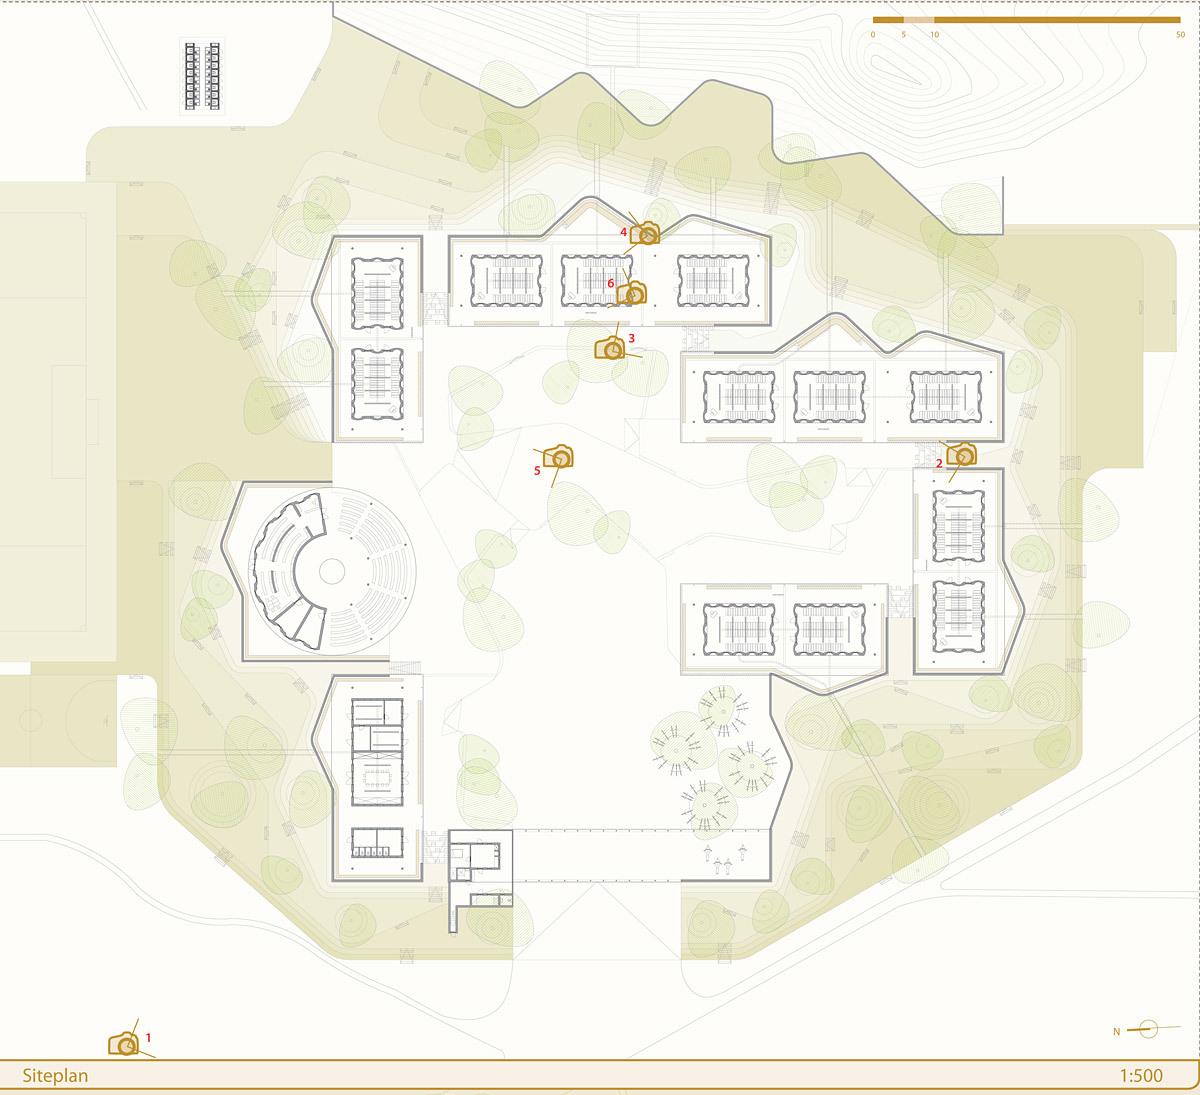 Global Holcim Awards 2012 Gold: Secondary school with passive ventilation system, Gando, Burkina Faso: Site plan. (Image © Holcim Foundation)